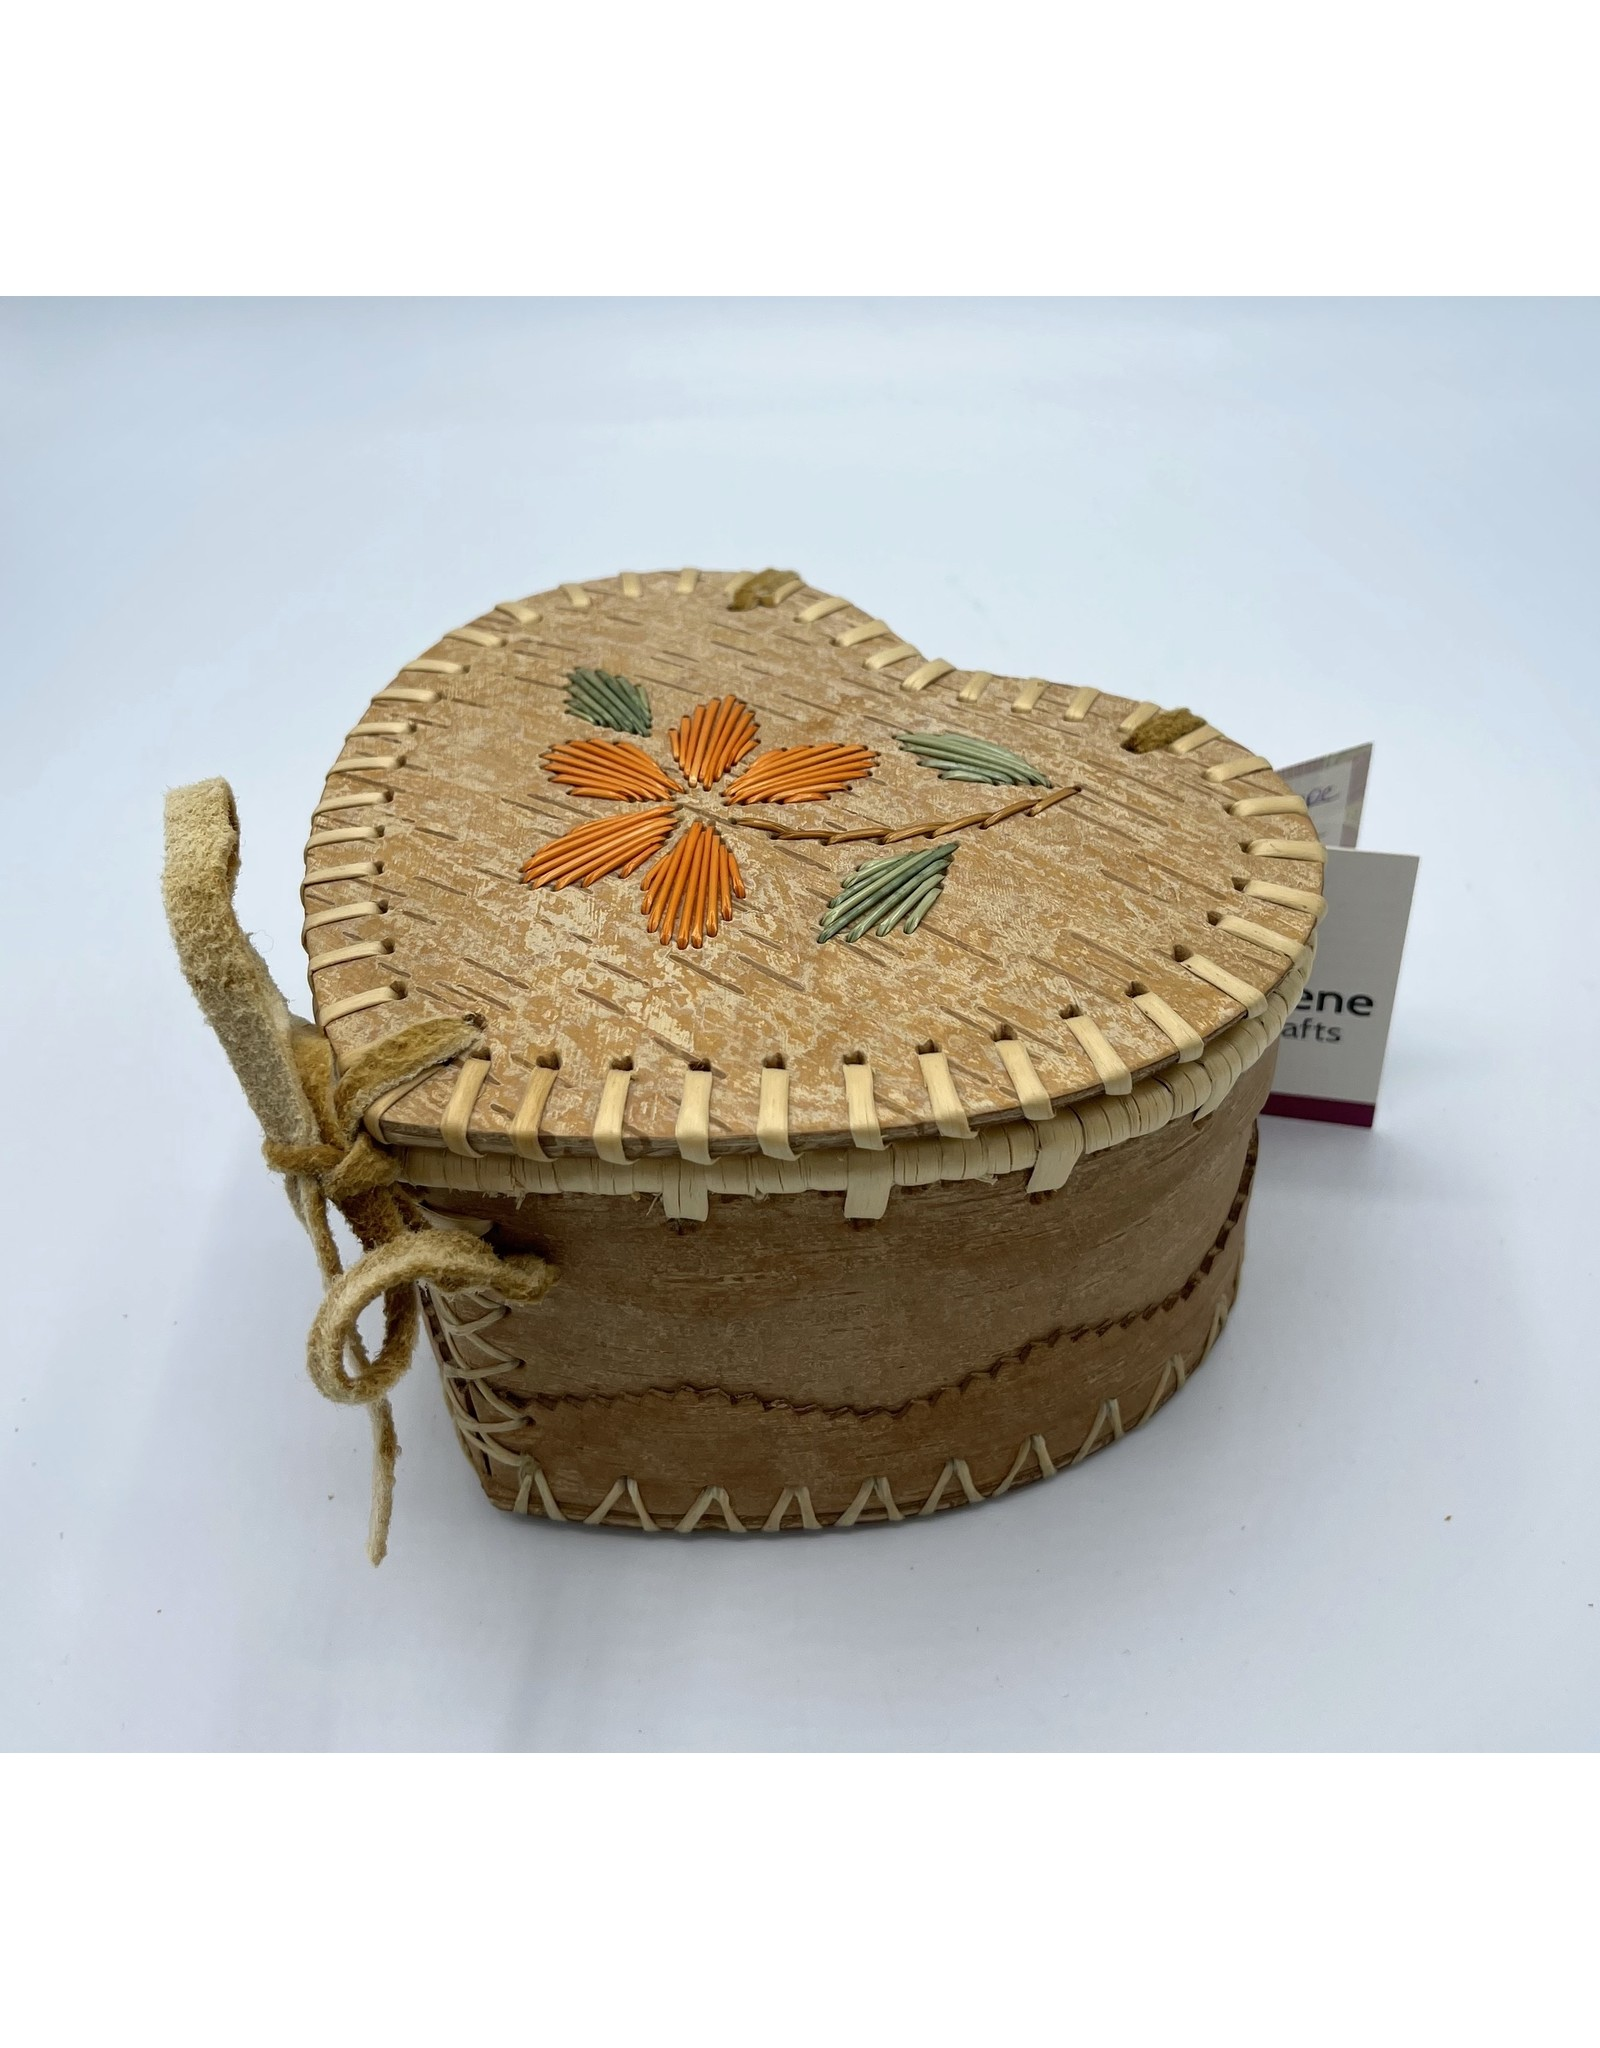 Medium Heart Birchbark Basket - 20071B